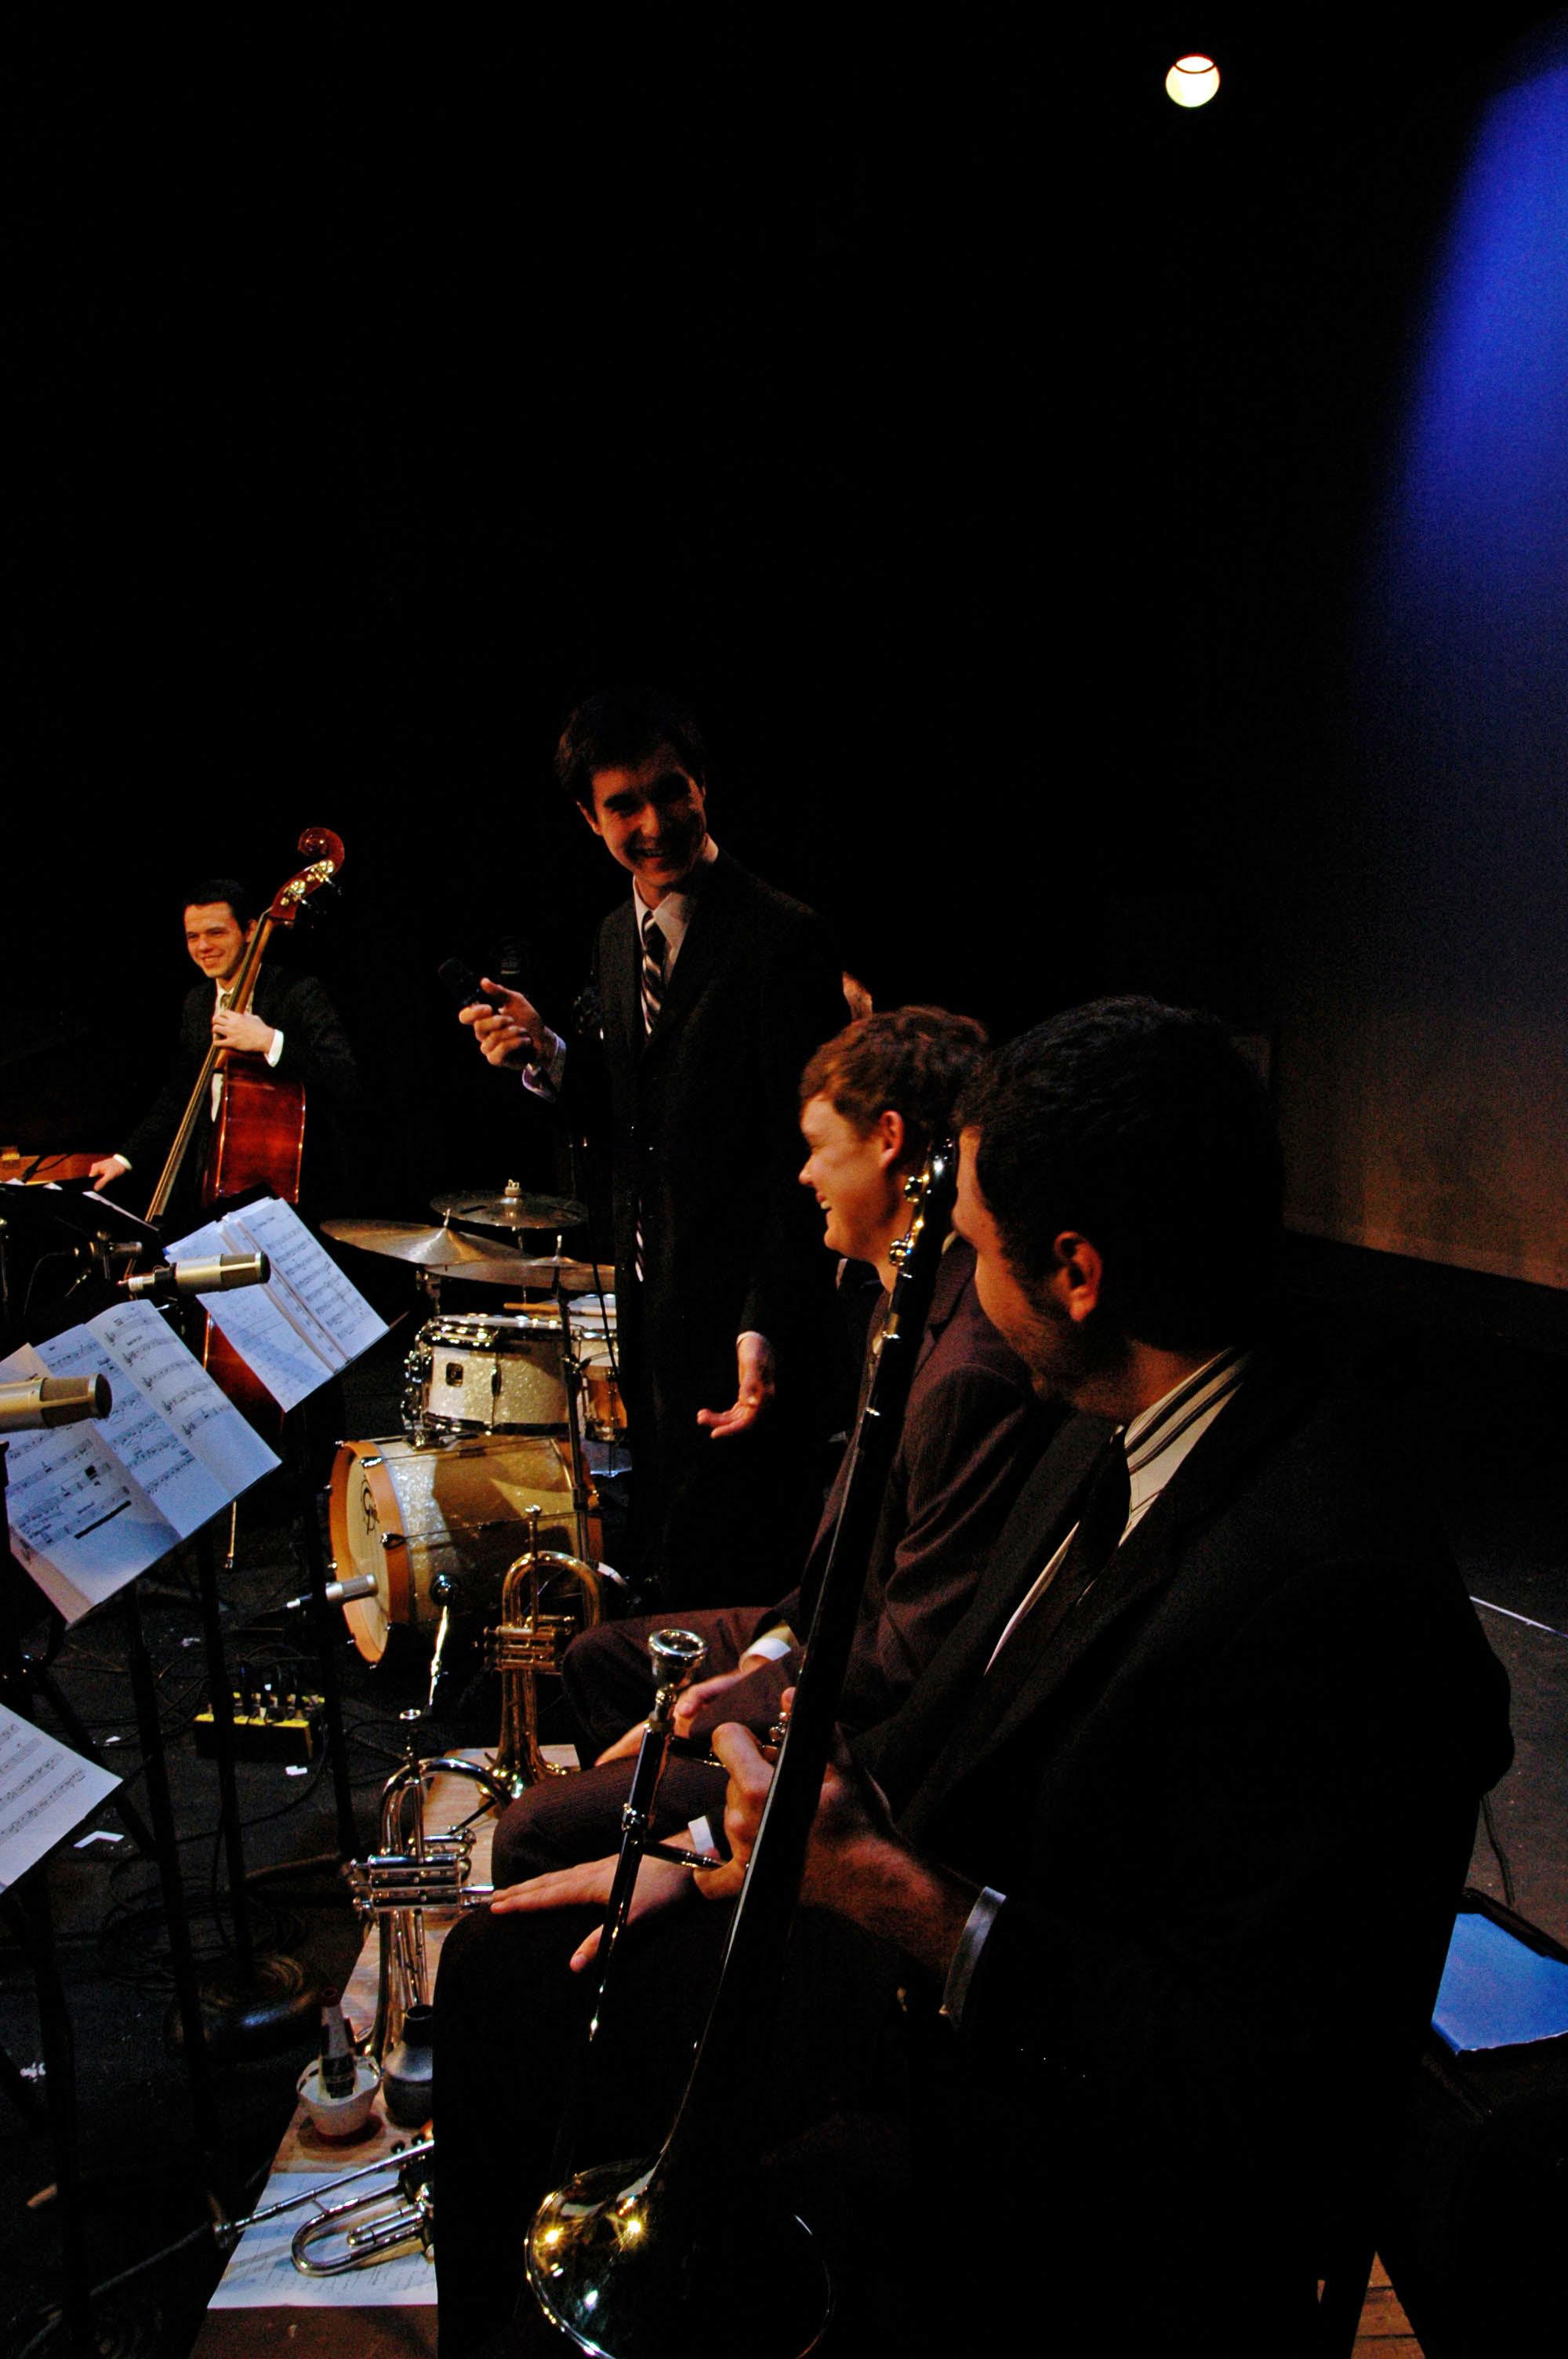 Jazz Conceptions Orchestra at Jacksonville Jazz Series Photo: Iman Vidal